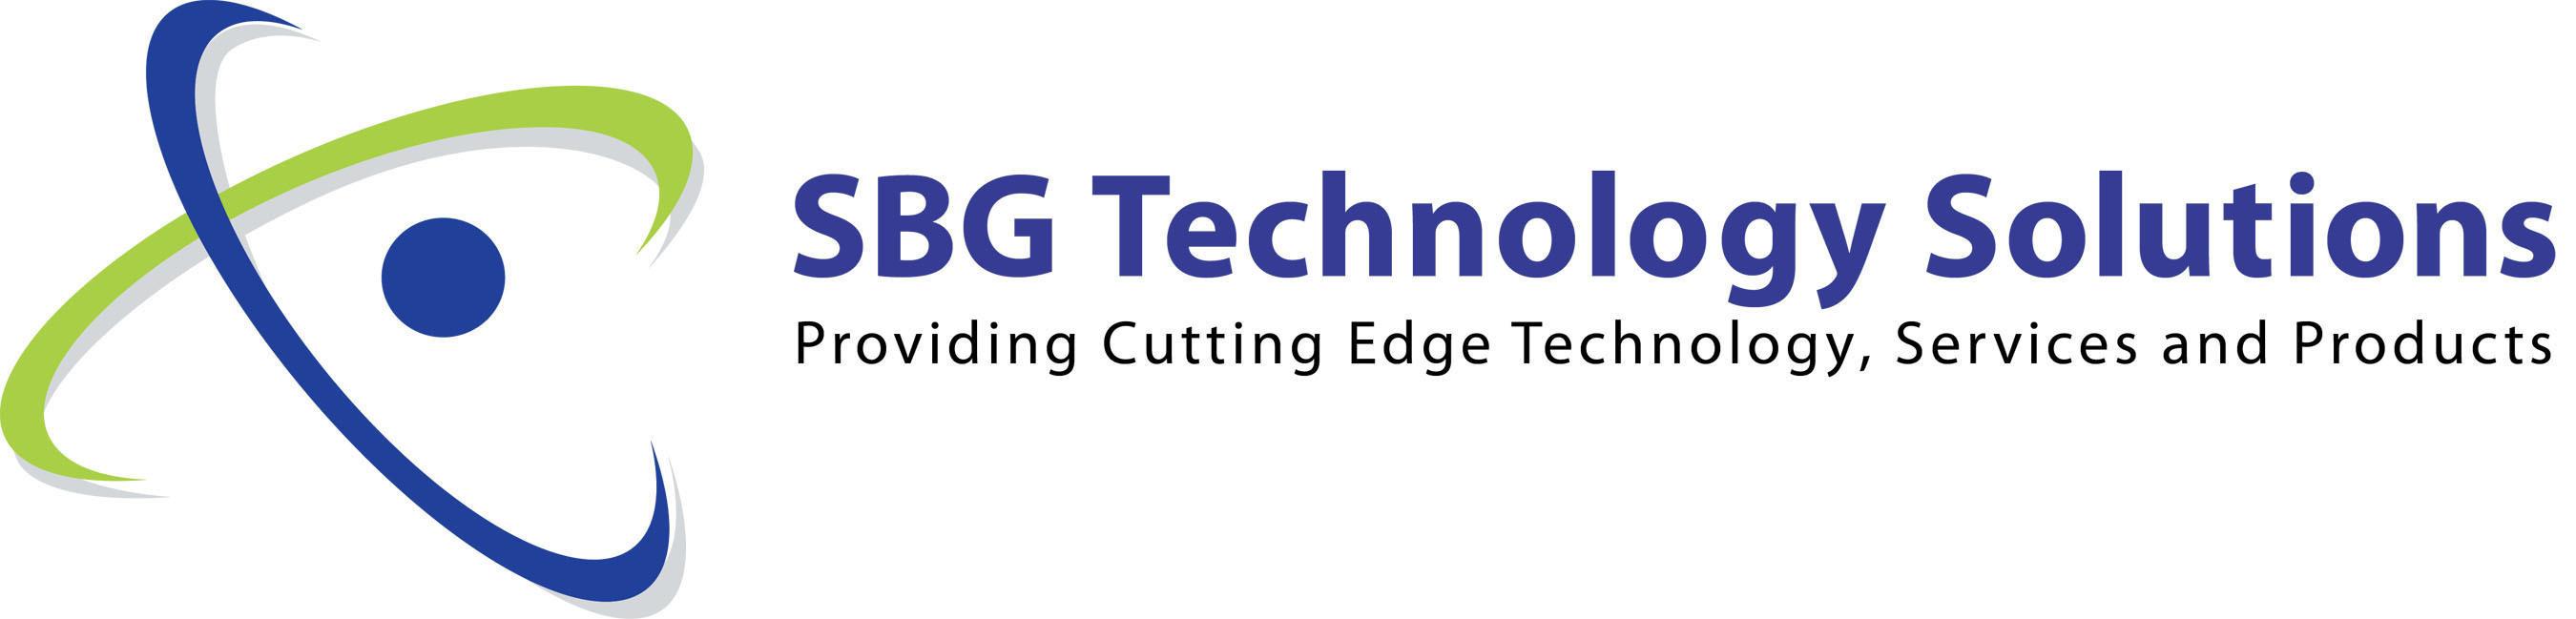 SBG Technology Solutions Logo